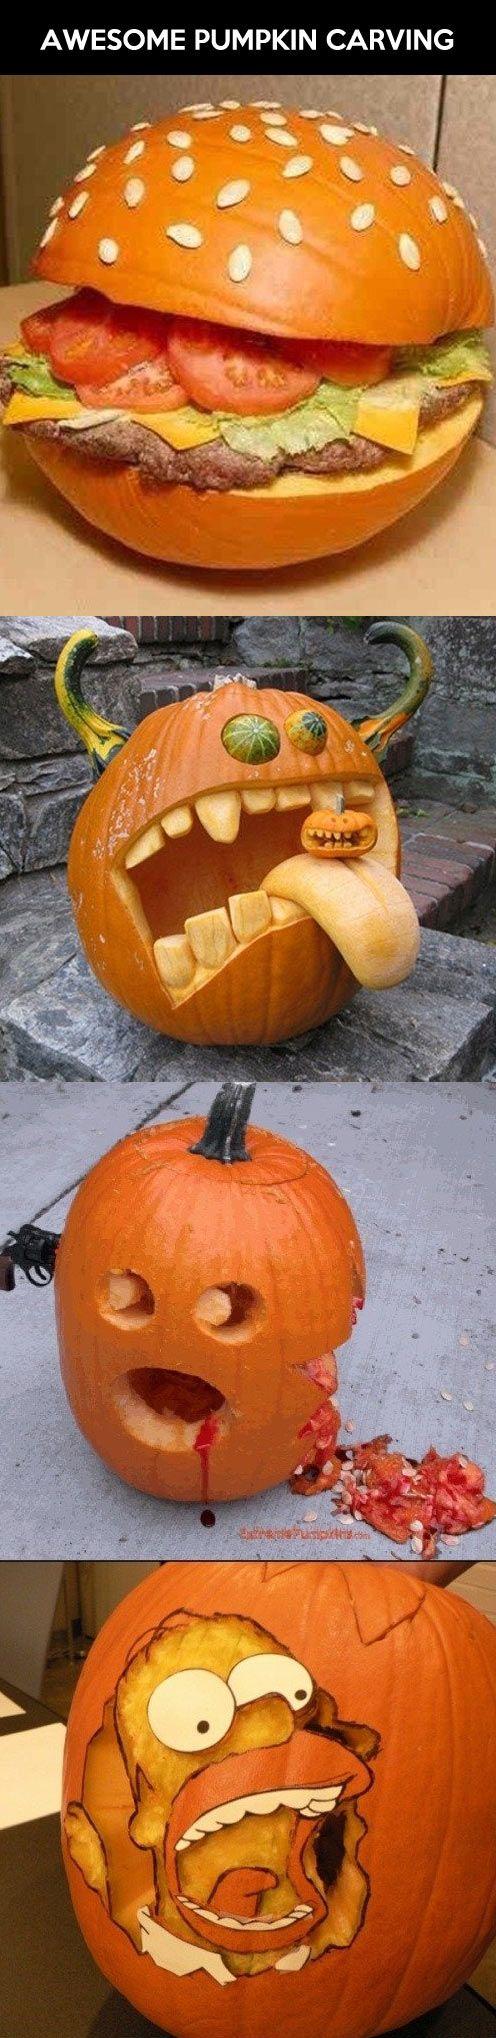 Best 25+ Pumpkin carving pictures ideas on Pinterest   Good ...